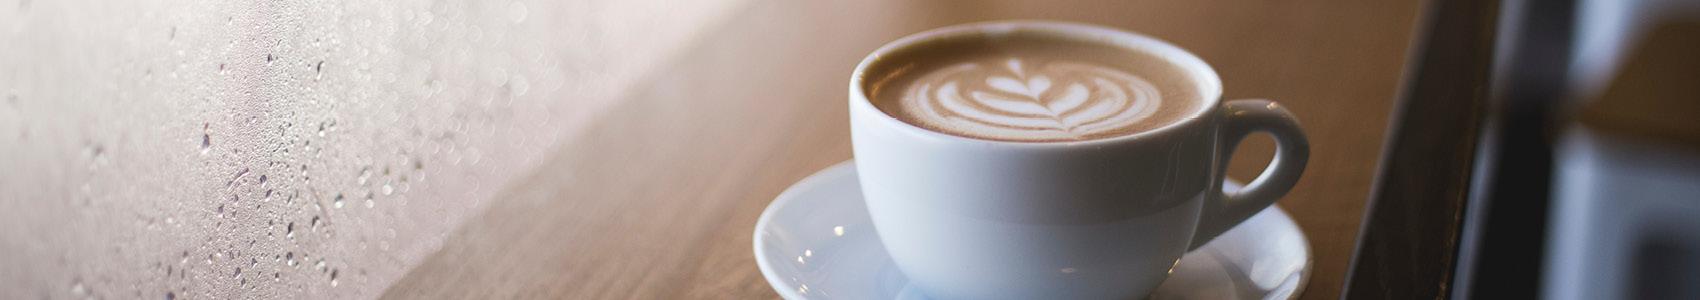 Caffeine Cruise - Donate